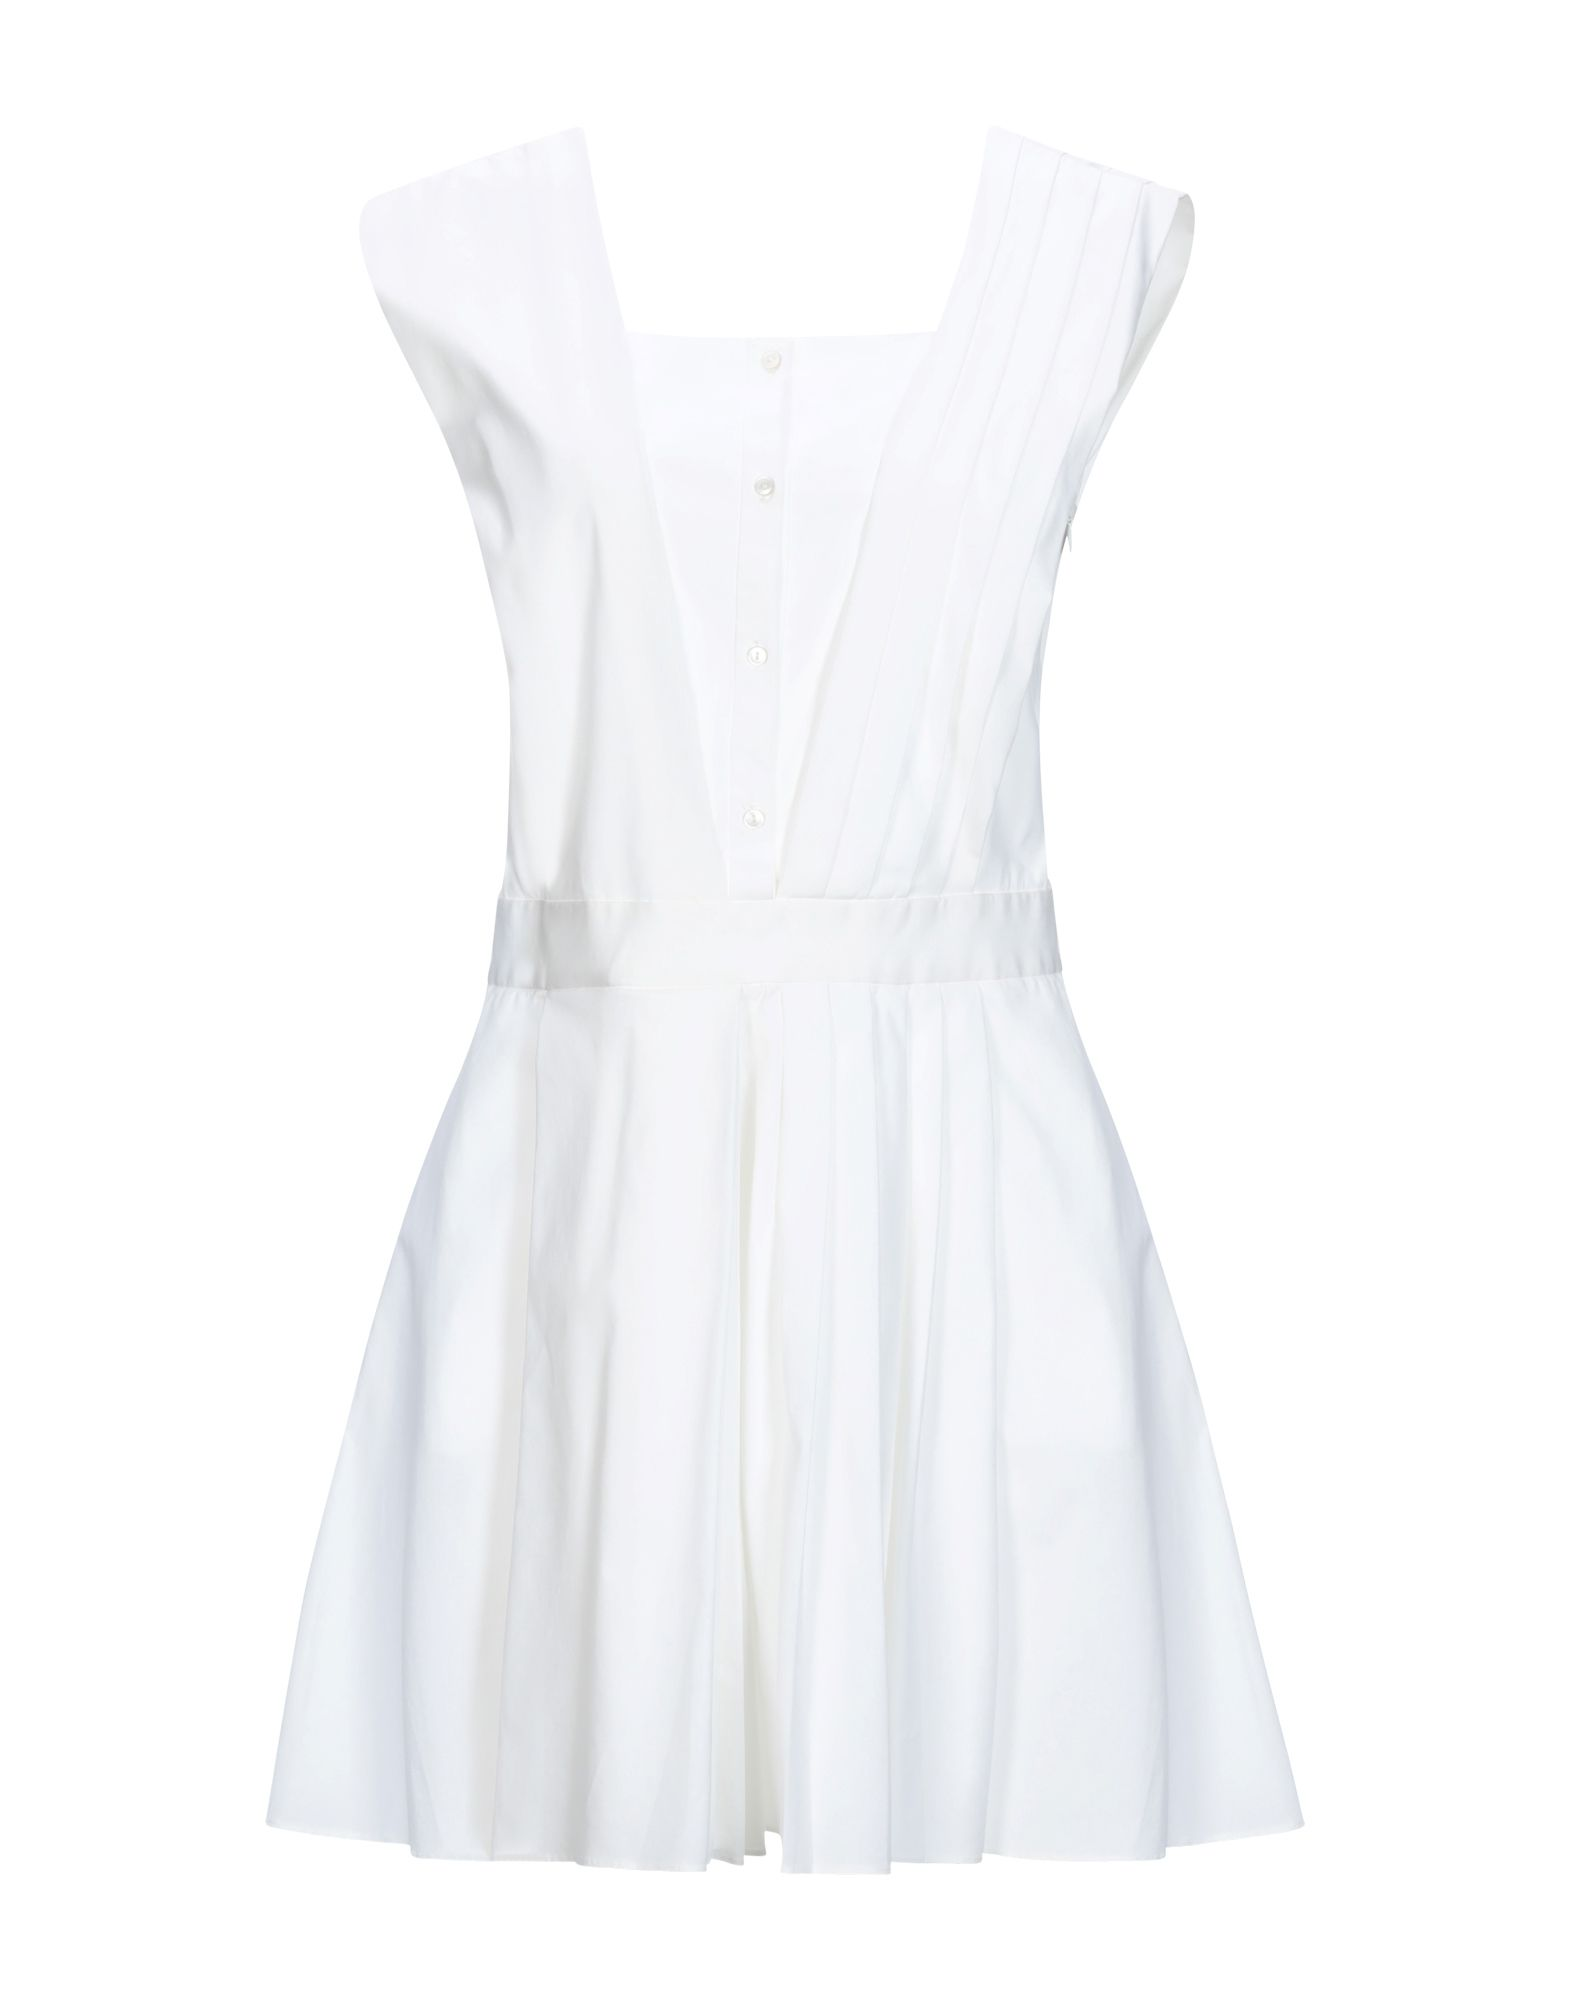 VIKTOR & ROLF Короткое платье платье рубашка fox yulia sway платье рубашка fox